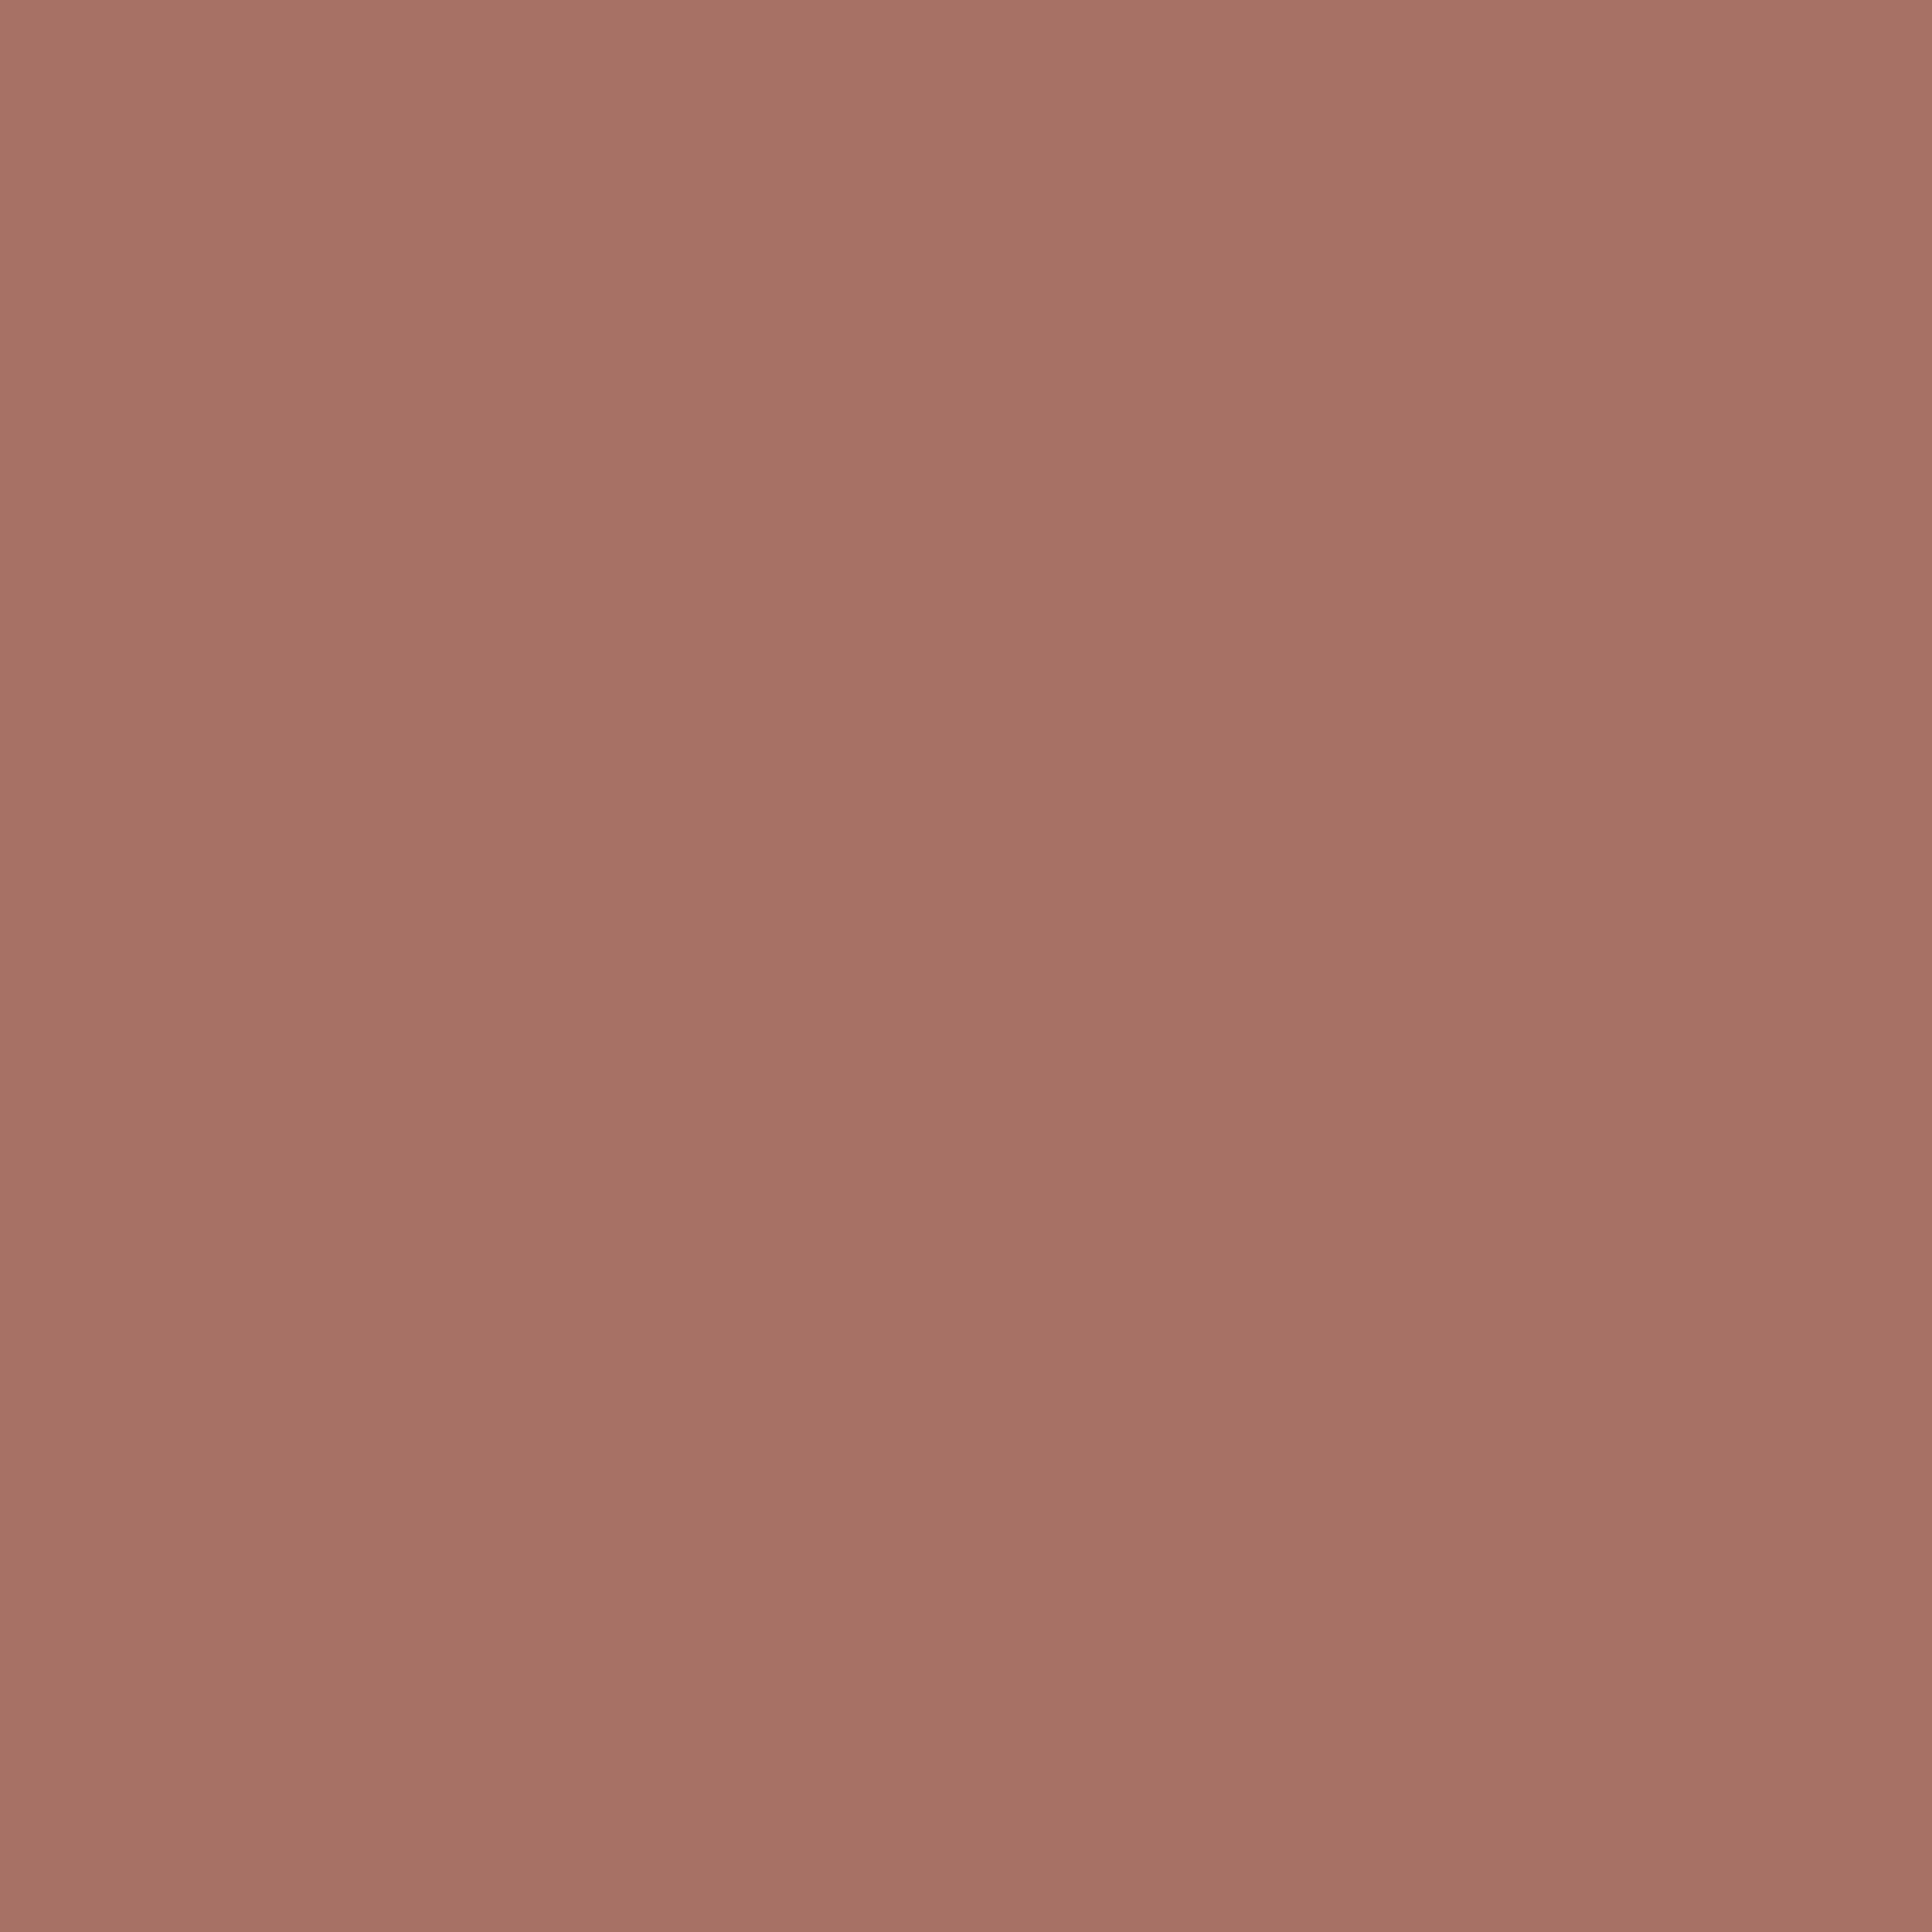 2732x2732 Blast-off Bronze Solid Color Background